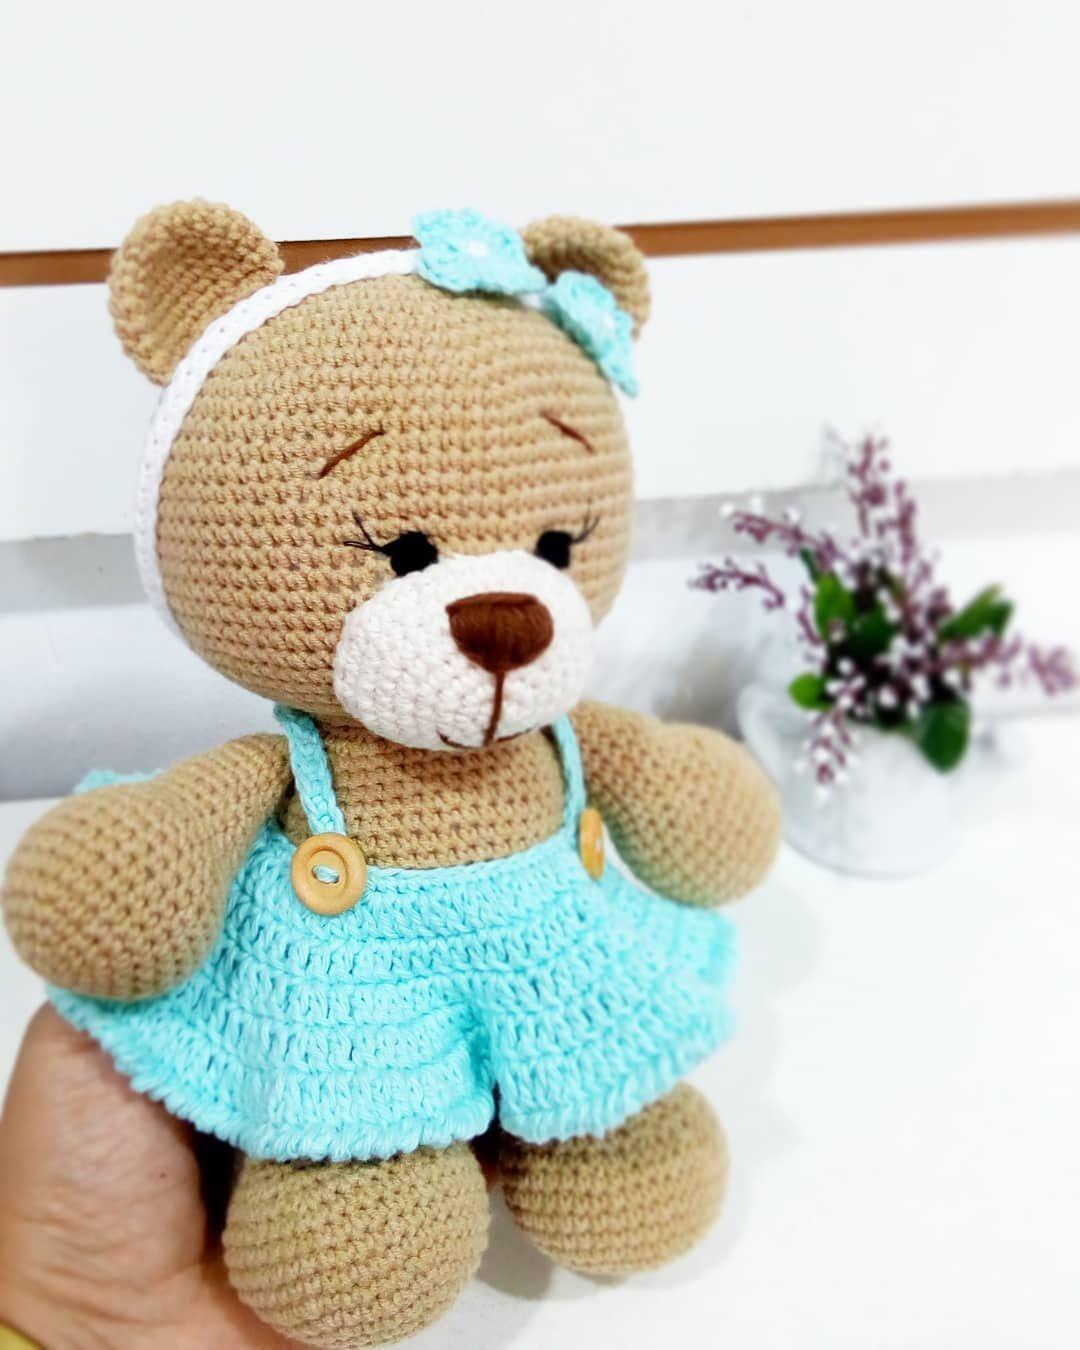 50 Best Amigurumi Basic Crochet Free Patterns - Amigurumi #crochetbearpatterns